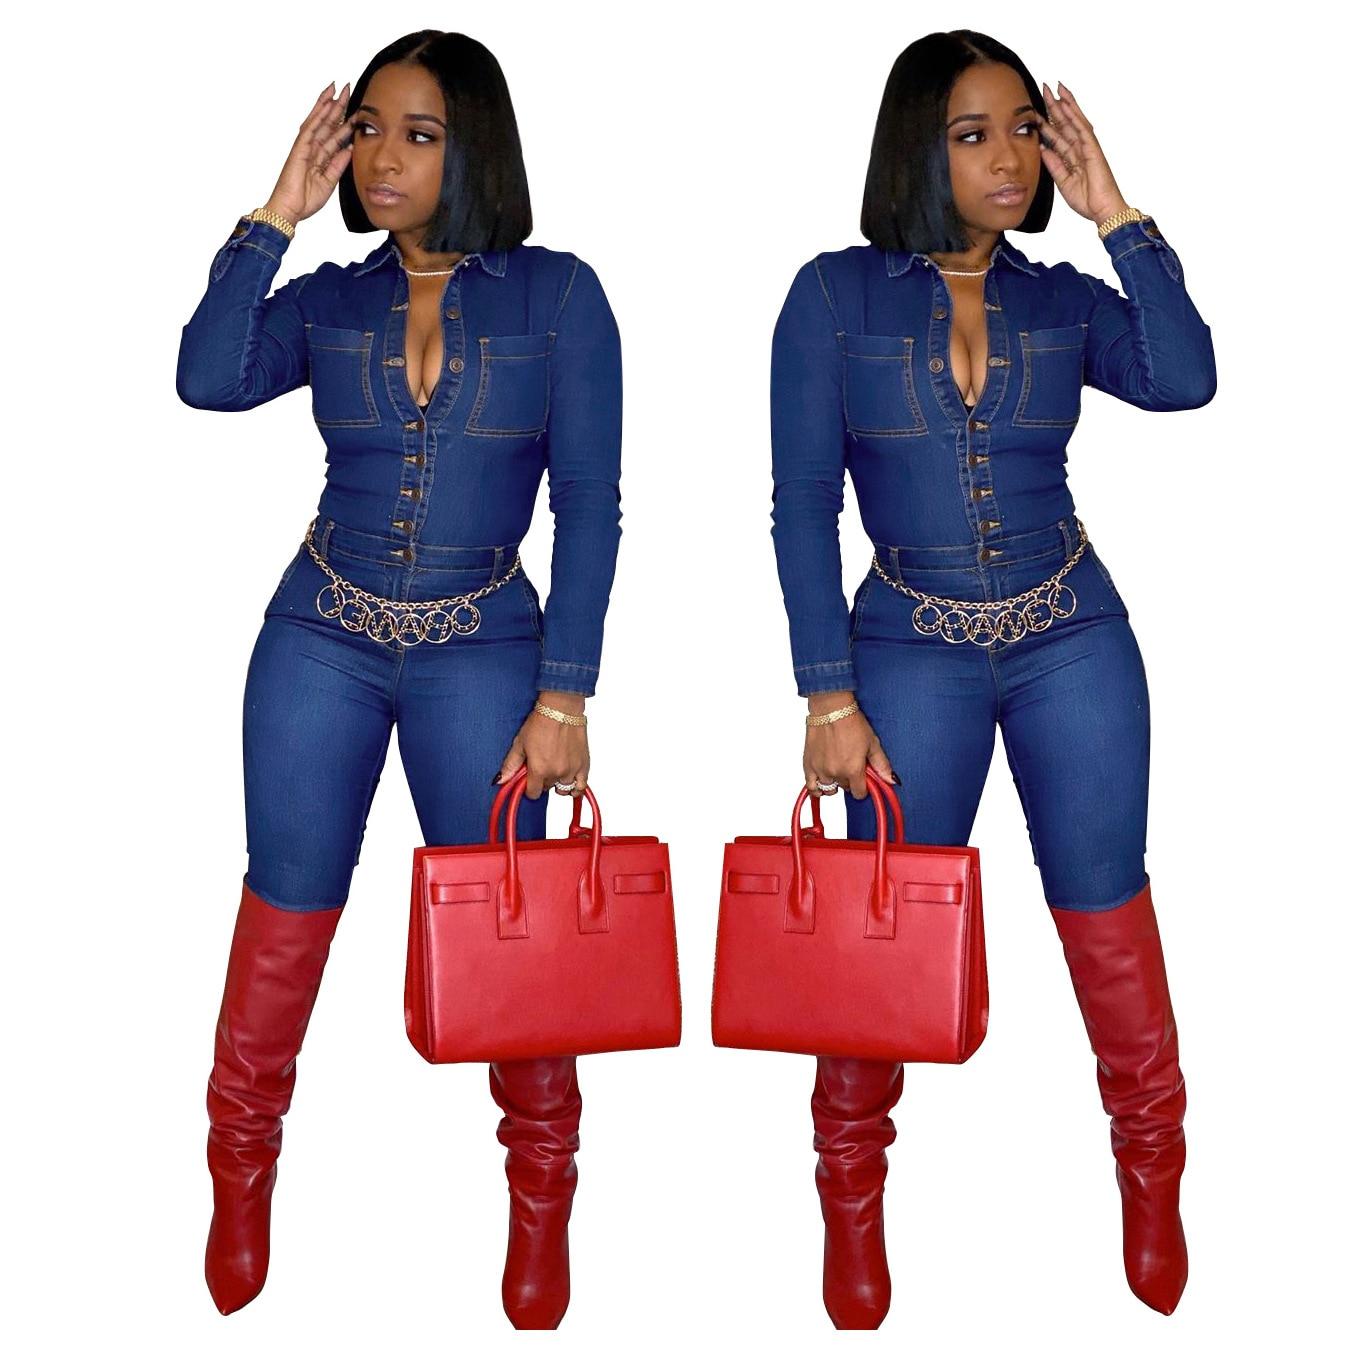 Women Autumn Denim Coat Slimming Clubwear Long Playsuit Button Casual Fashion Bodycon Party Slim Jum